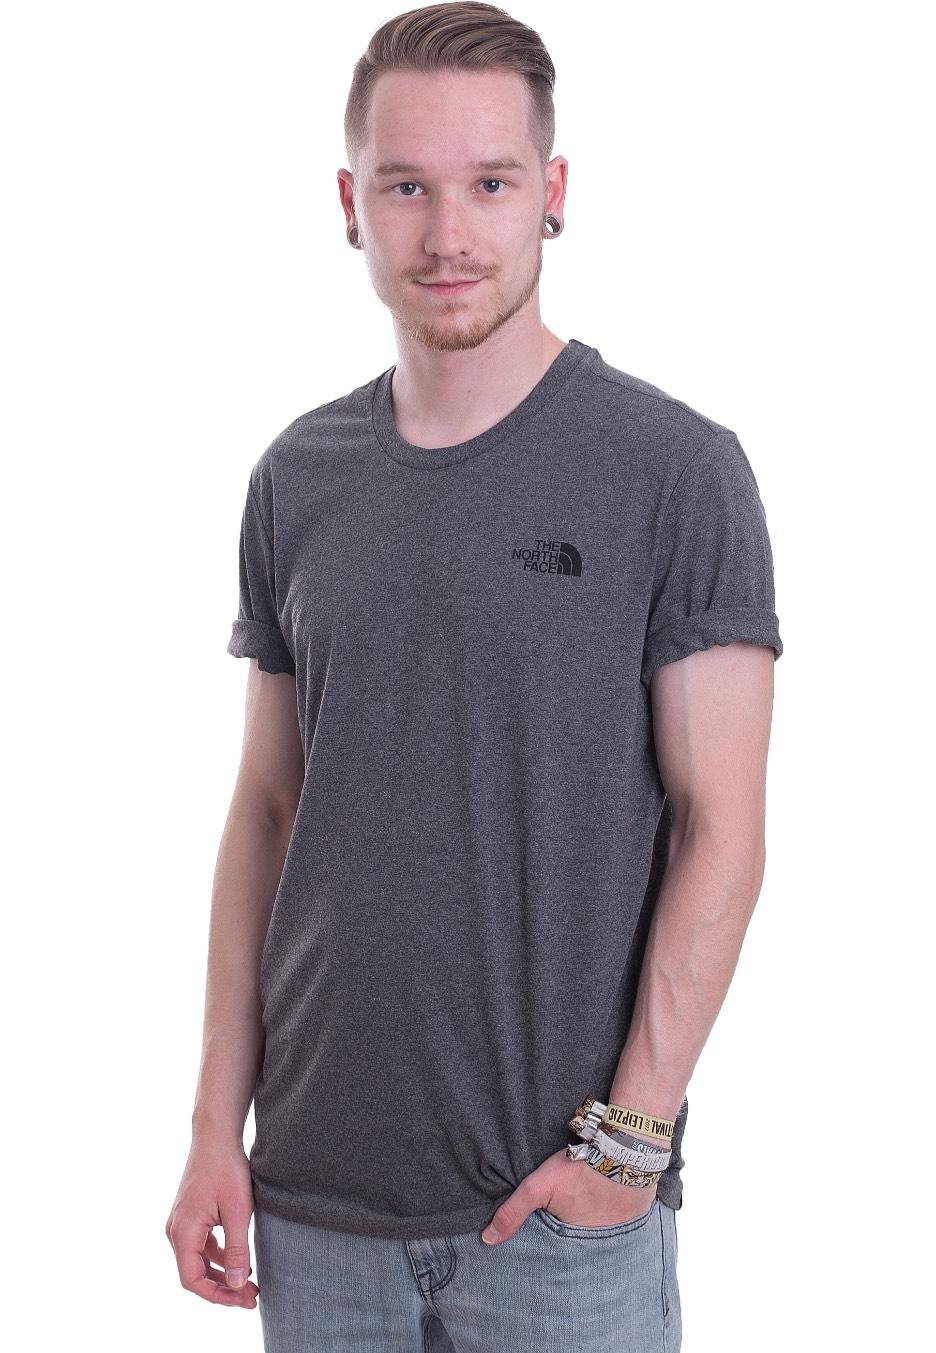 c7c5da1f The North Face - Simple Dome TNF Medium Grey Heather - T-Shirt - Streetwear  Shop - Impericon.com UK